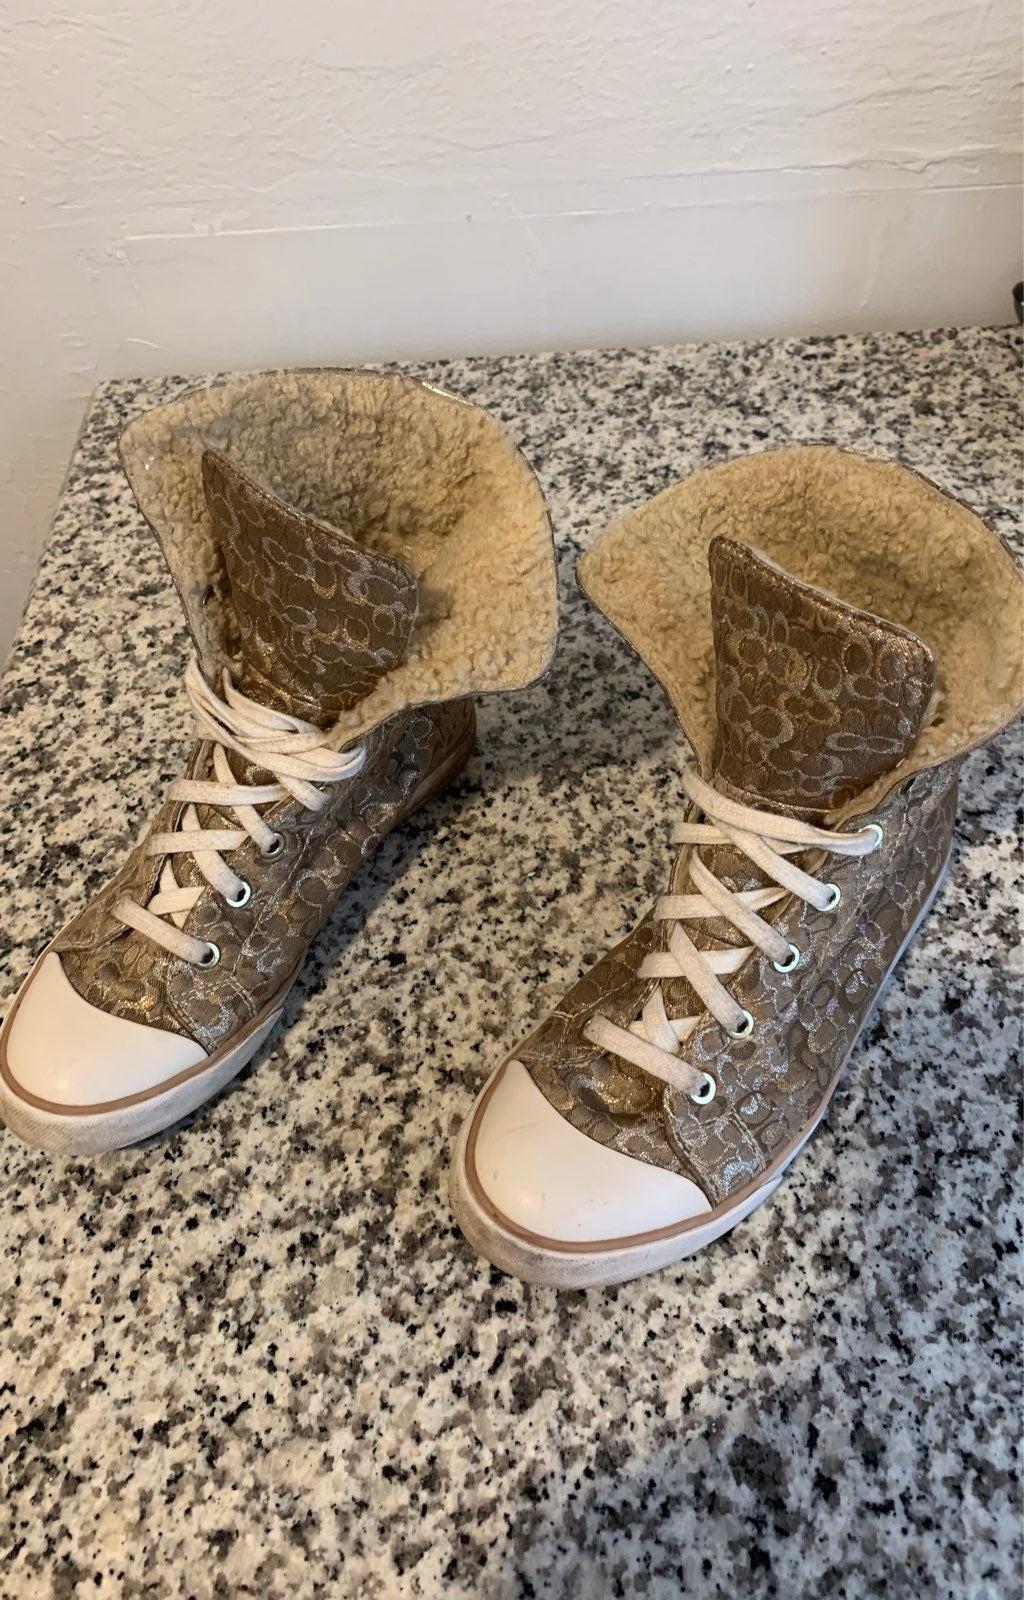 Coach High Top Fashion Sneakers